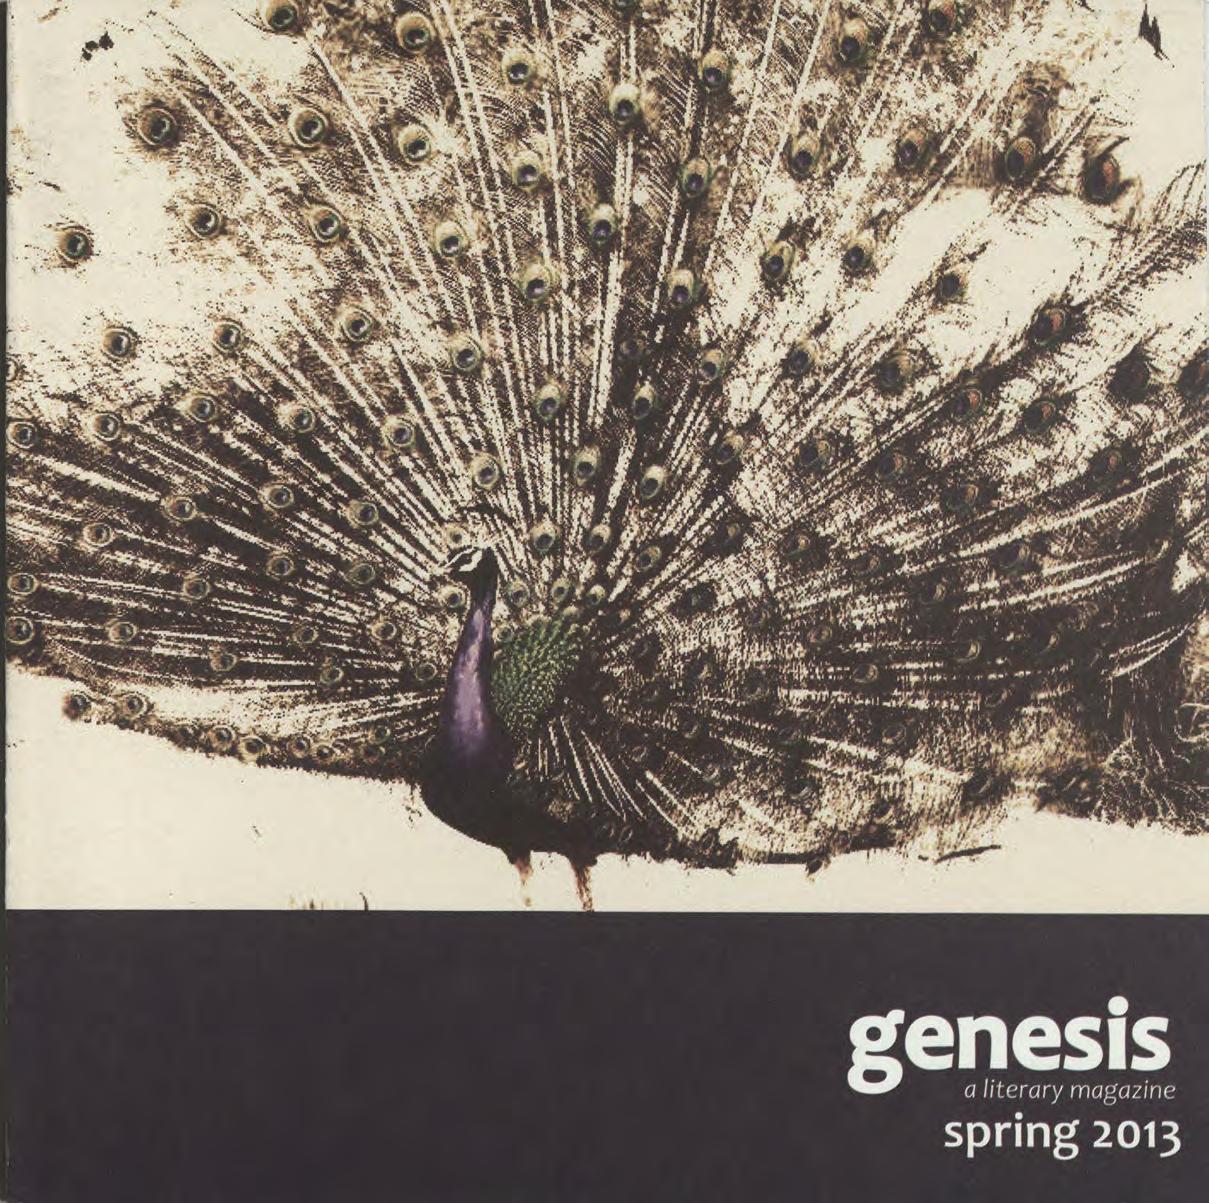 genesis spring 2013 cover